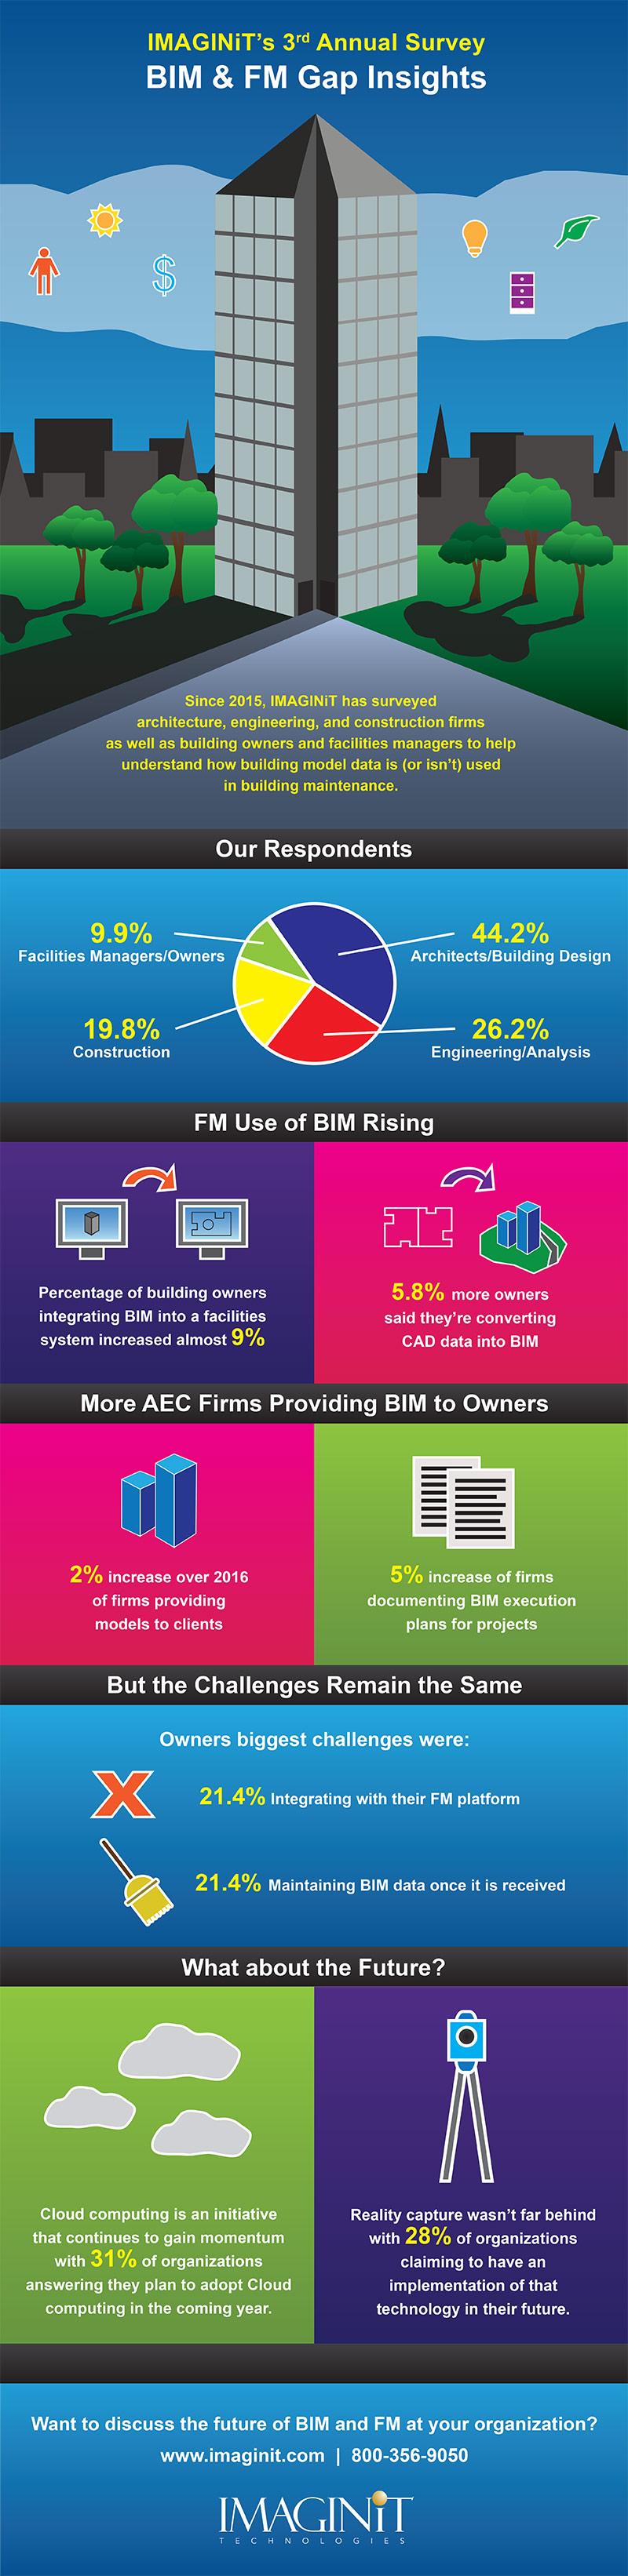 BIM_FM_Infographic_12-15-17